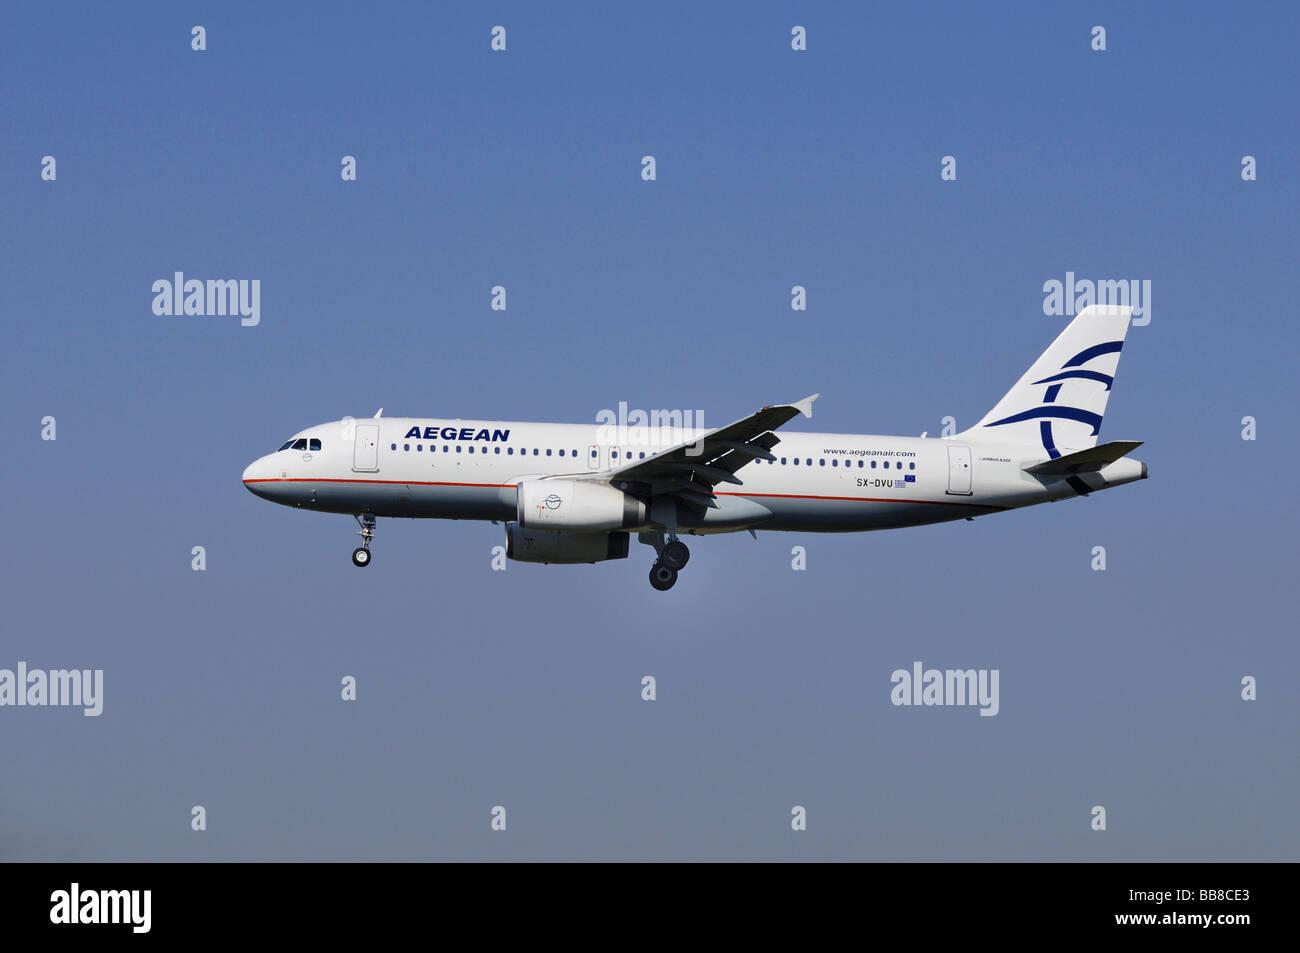 Airbus A 320, airplane of Aegean Air, Greek Airline Aegean Airways - Stock Image